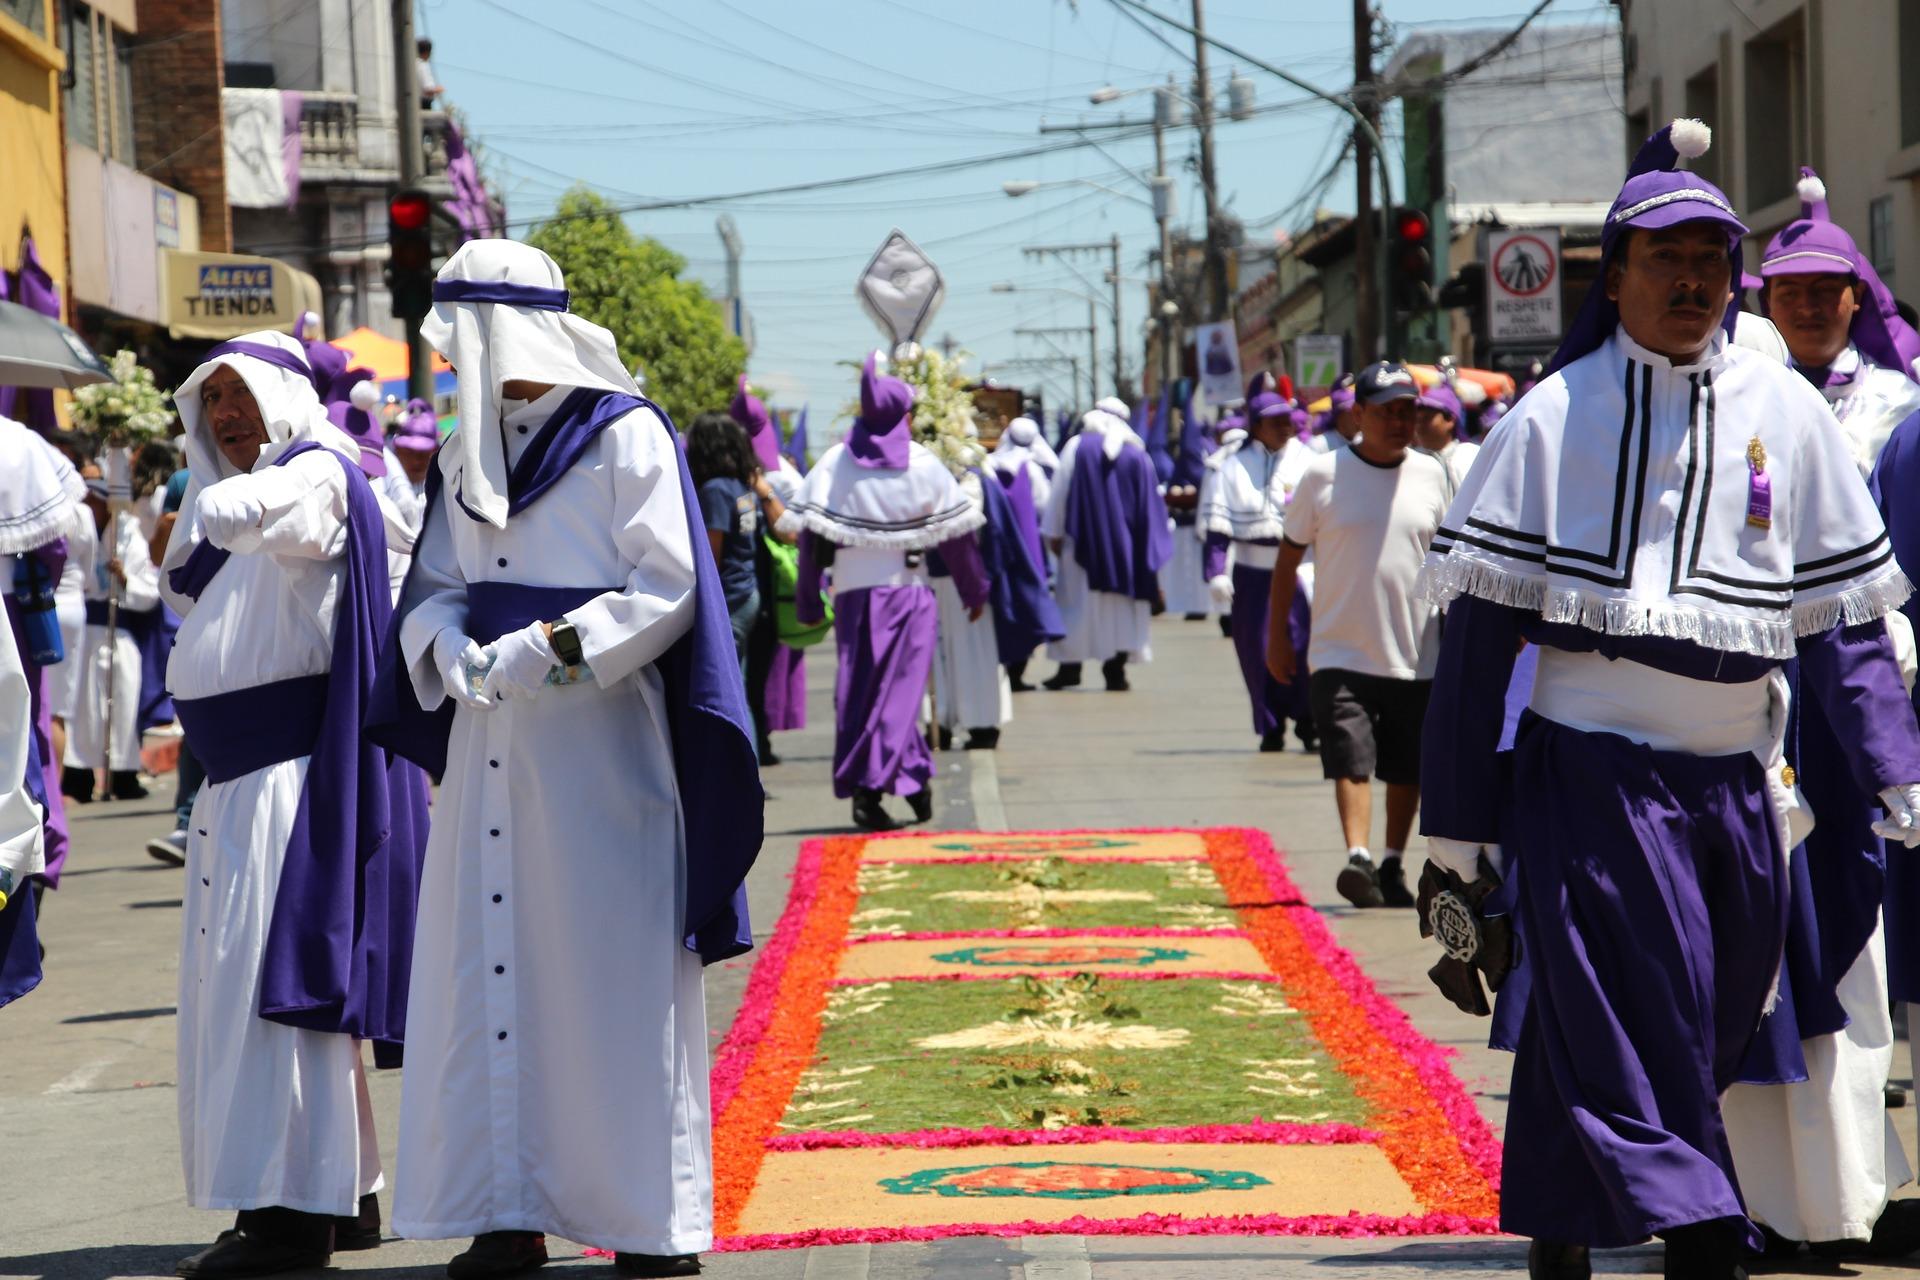 La Antigua Guatemala Ostern - Kostümierte Menschen